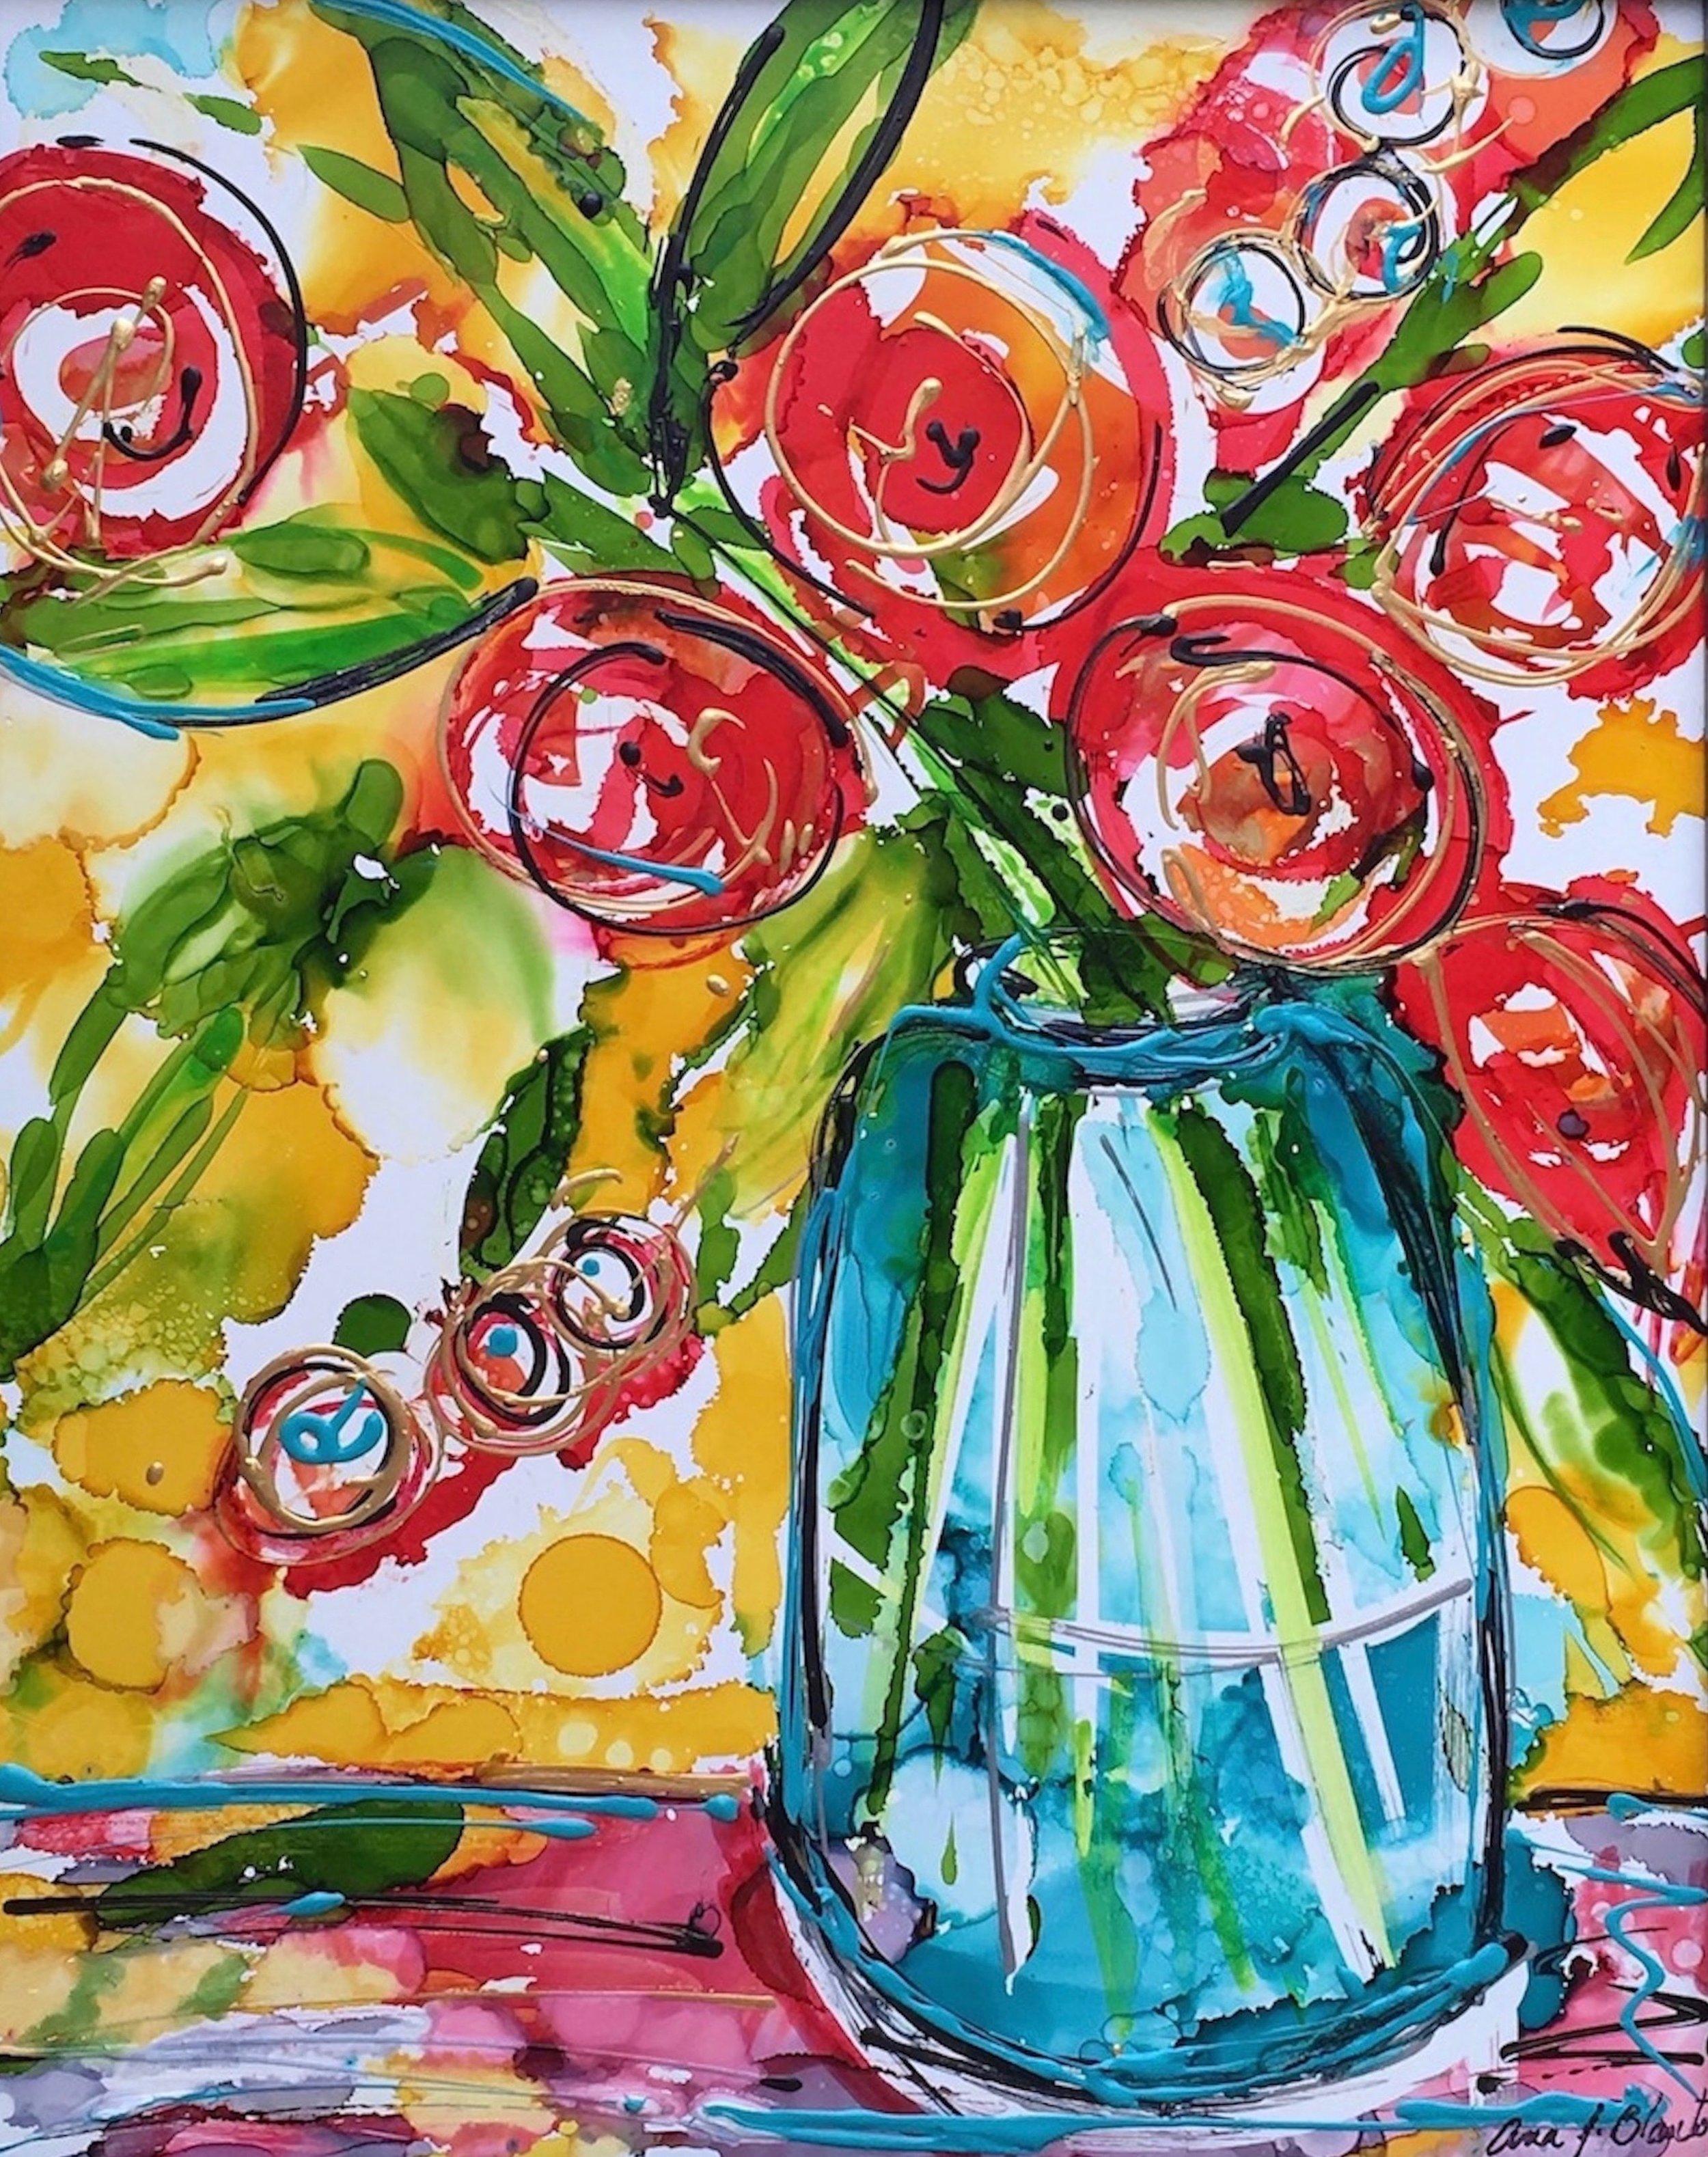 Ana J. Blanton,  Flowers and Sunlight